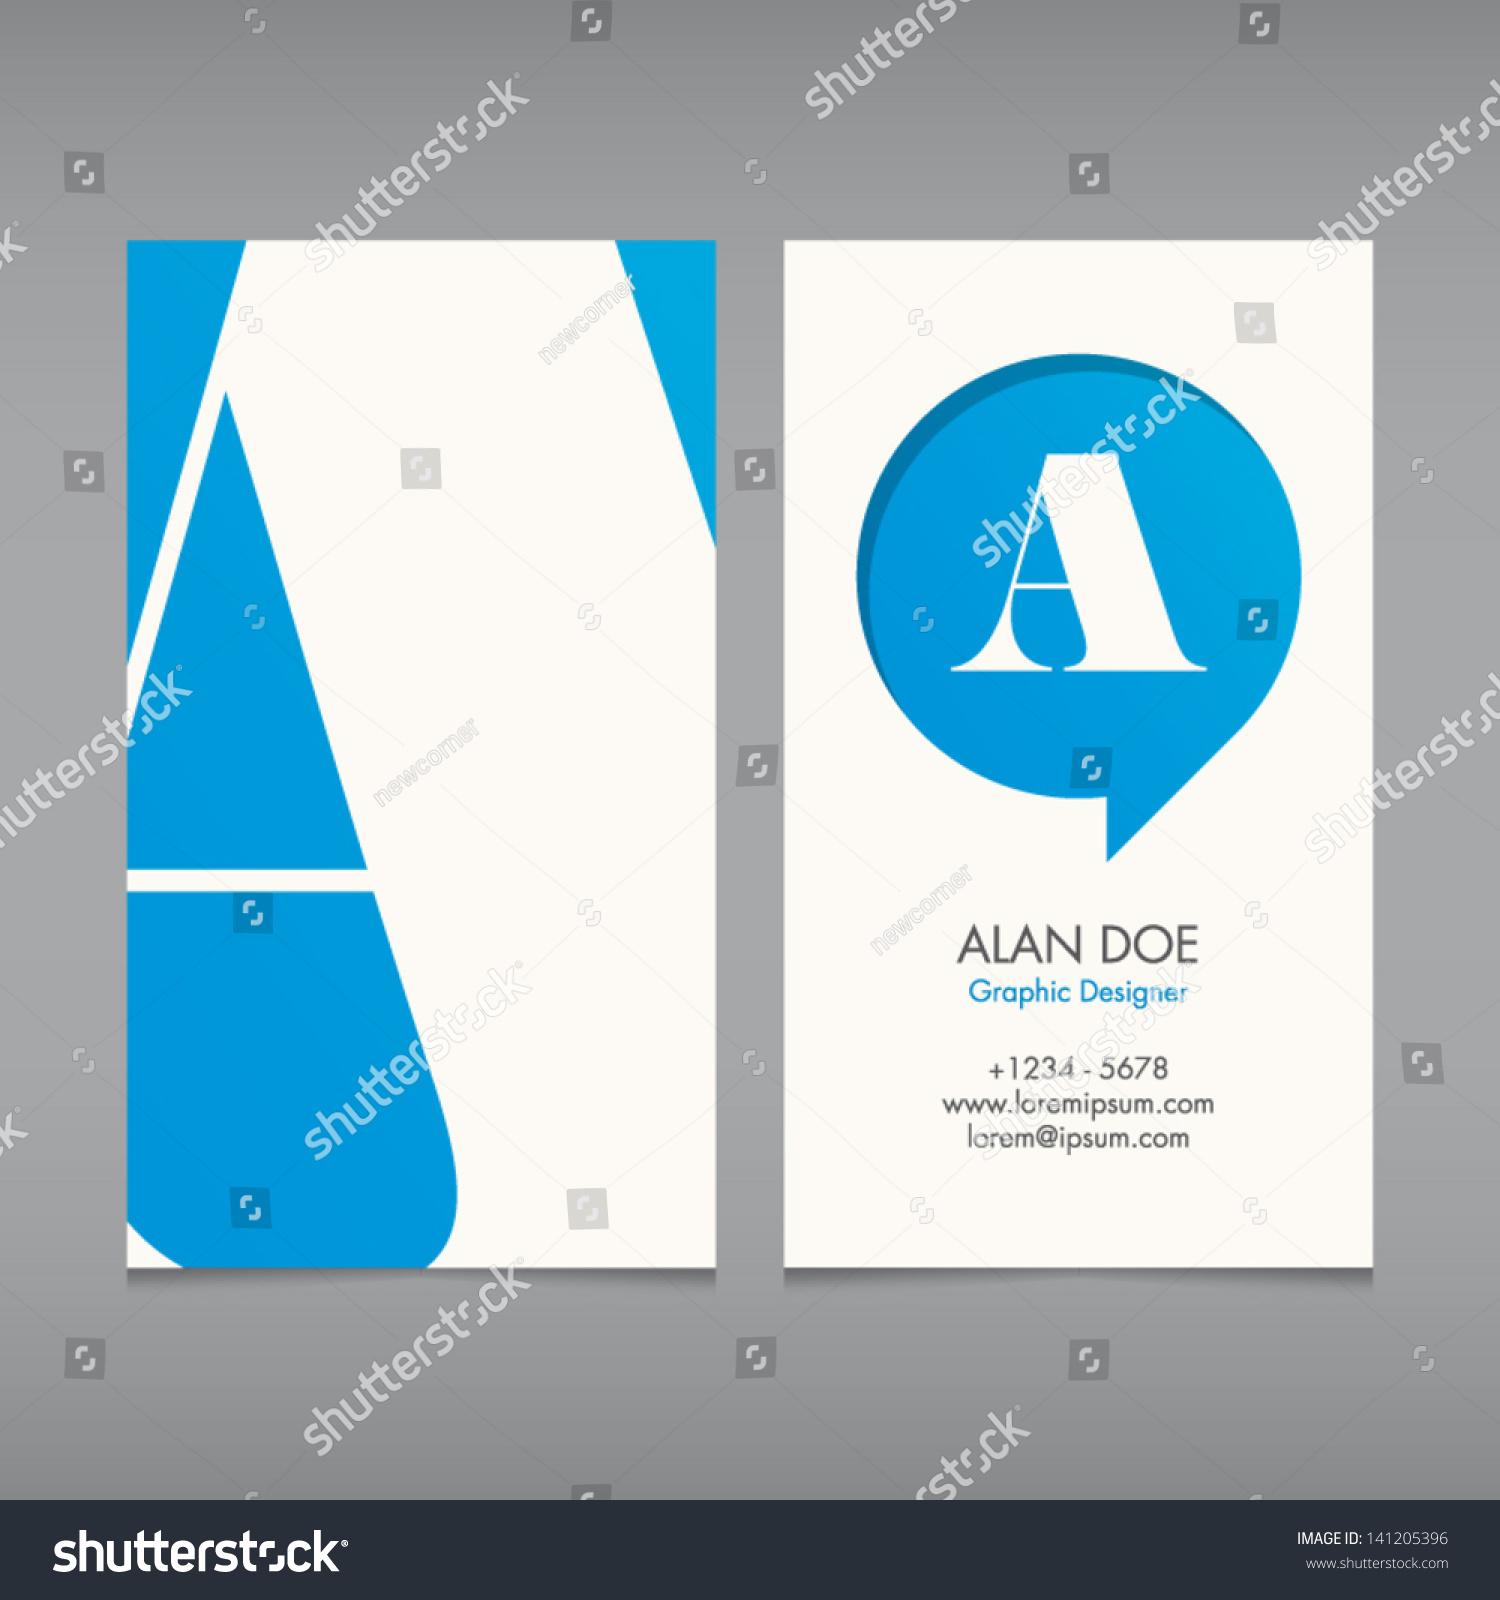 Business Card Vector Template Alphabet Letter Stock Vector ...